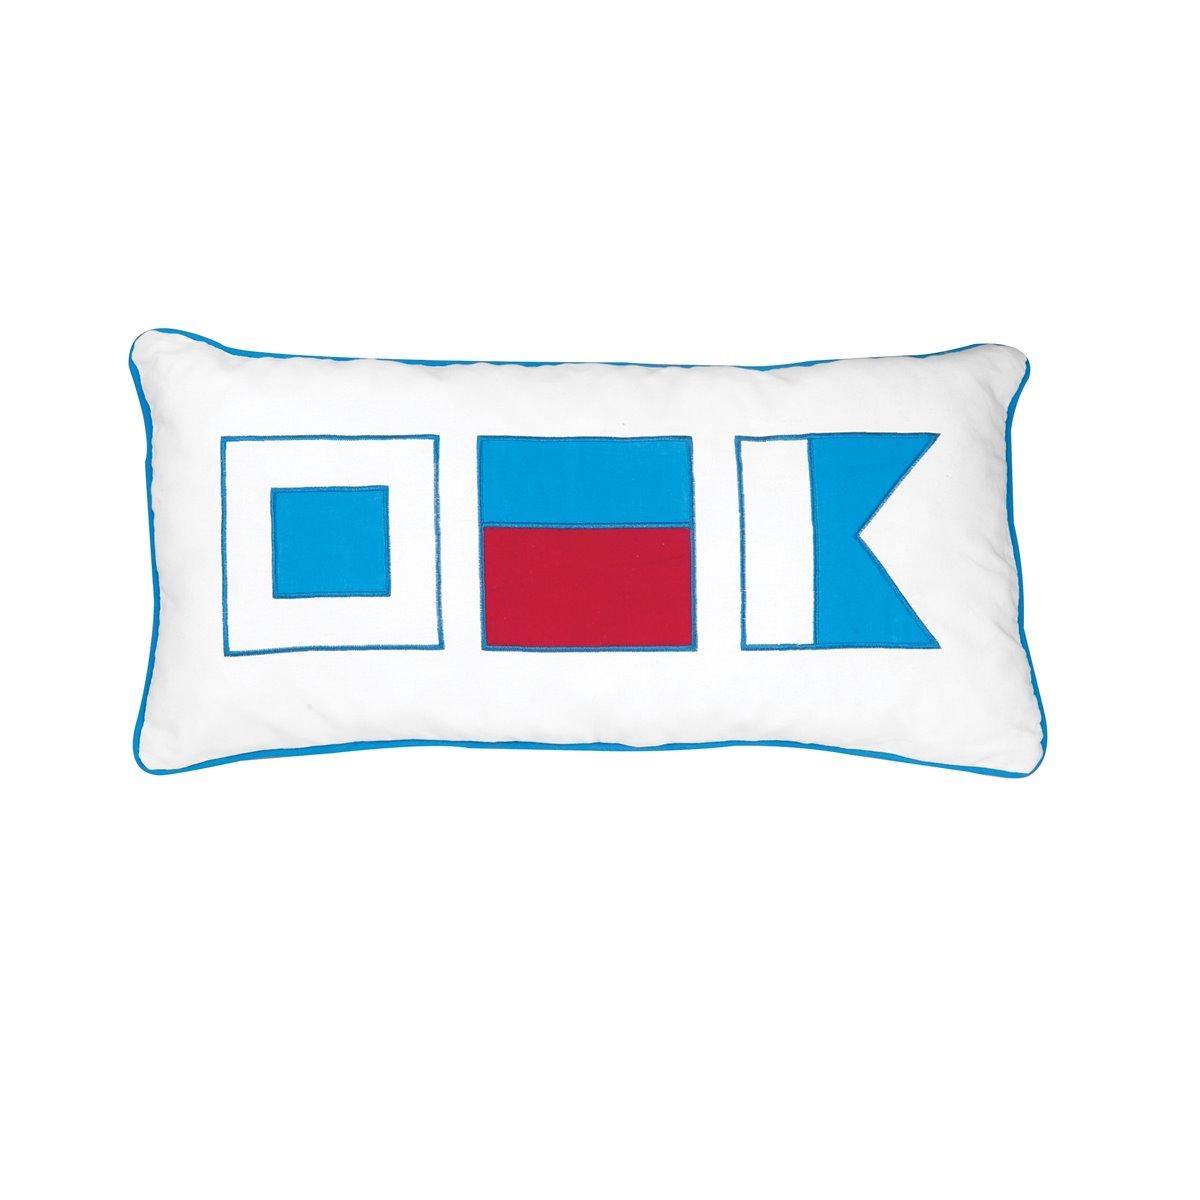 Windward Port Applique Flags Pillow